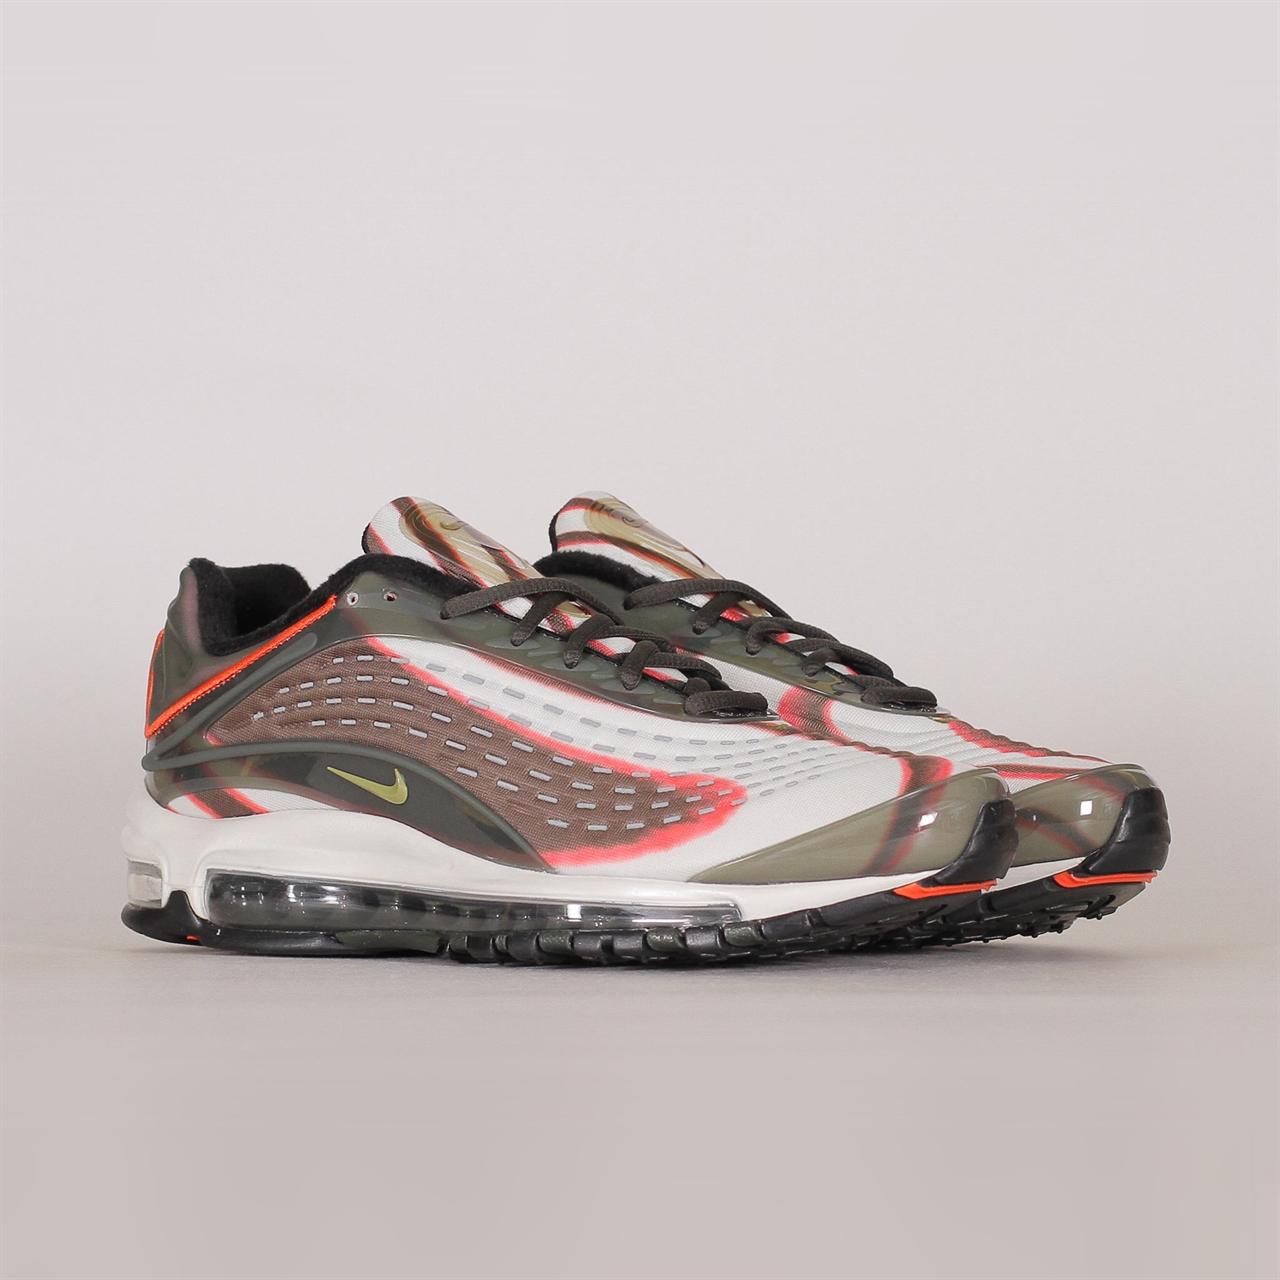 923fdb7f28 Nike Sportswear Air Max Deluxe (AJ7831-300) - Shelta